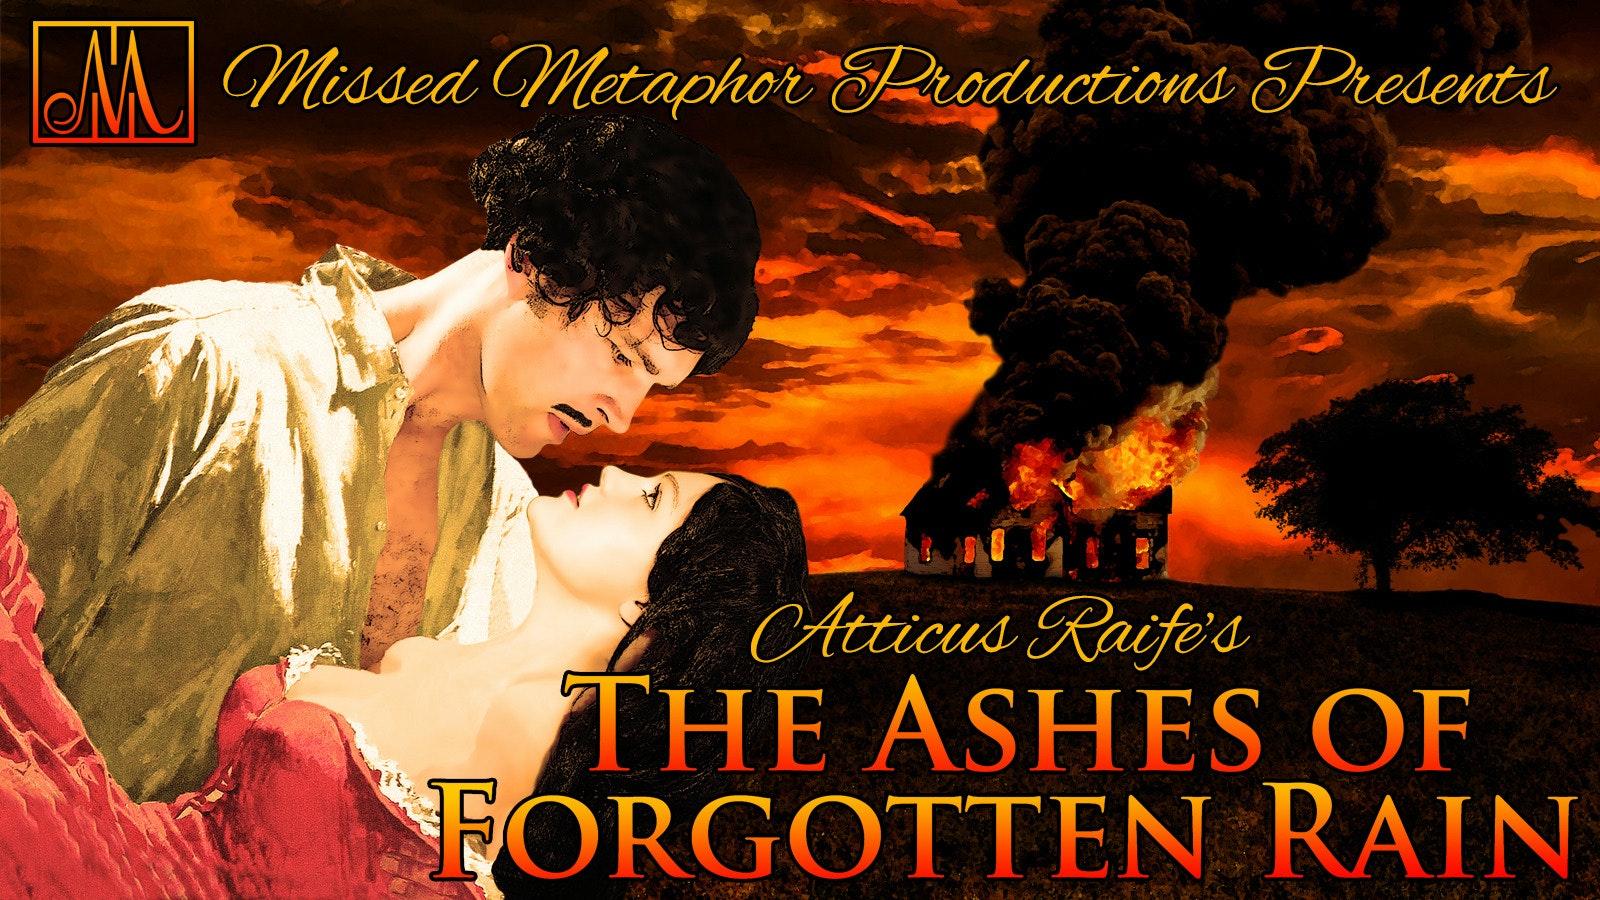 The Ashes of Forgotten Rain